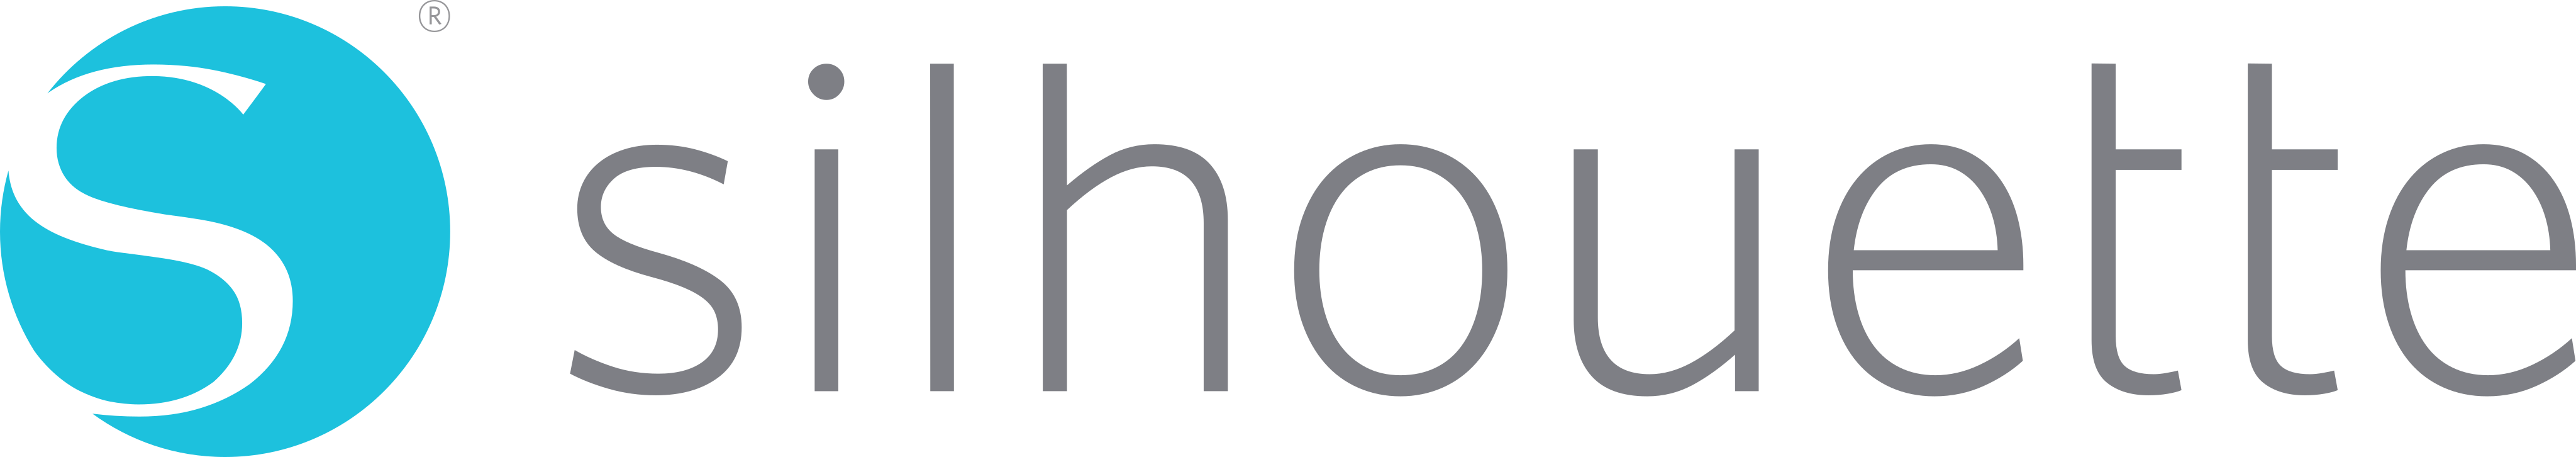 Silhouette Logo.